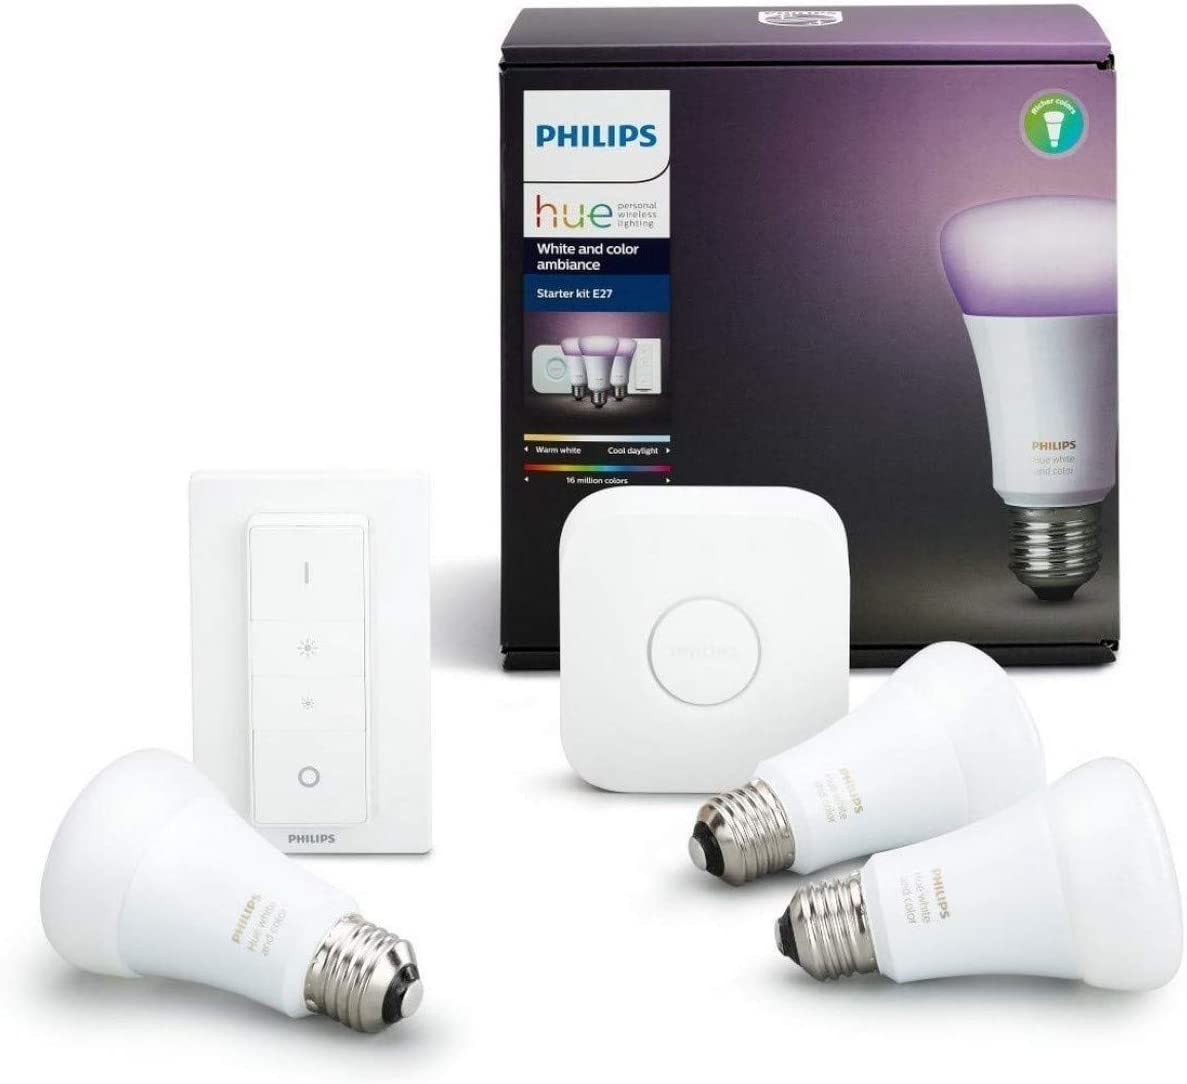 Philips Hue White und Color Ambiance E27 LED Lampe Starter Set